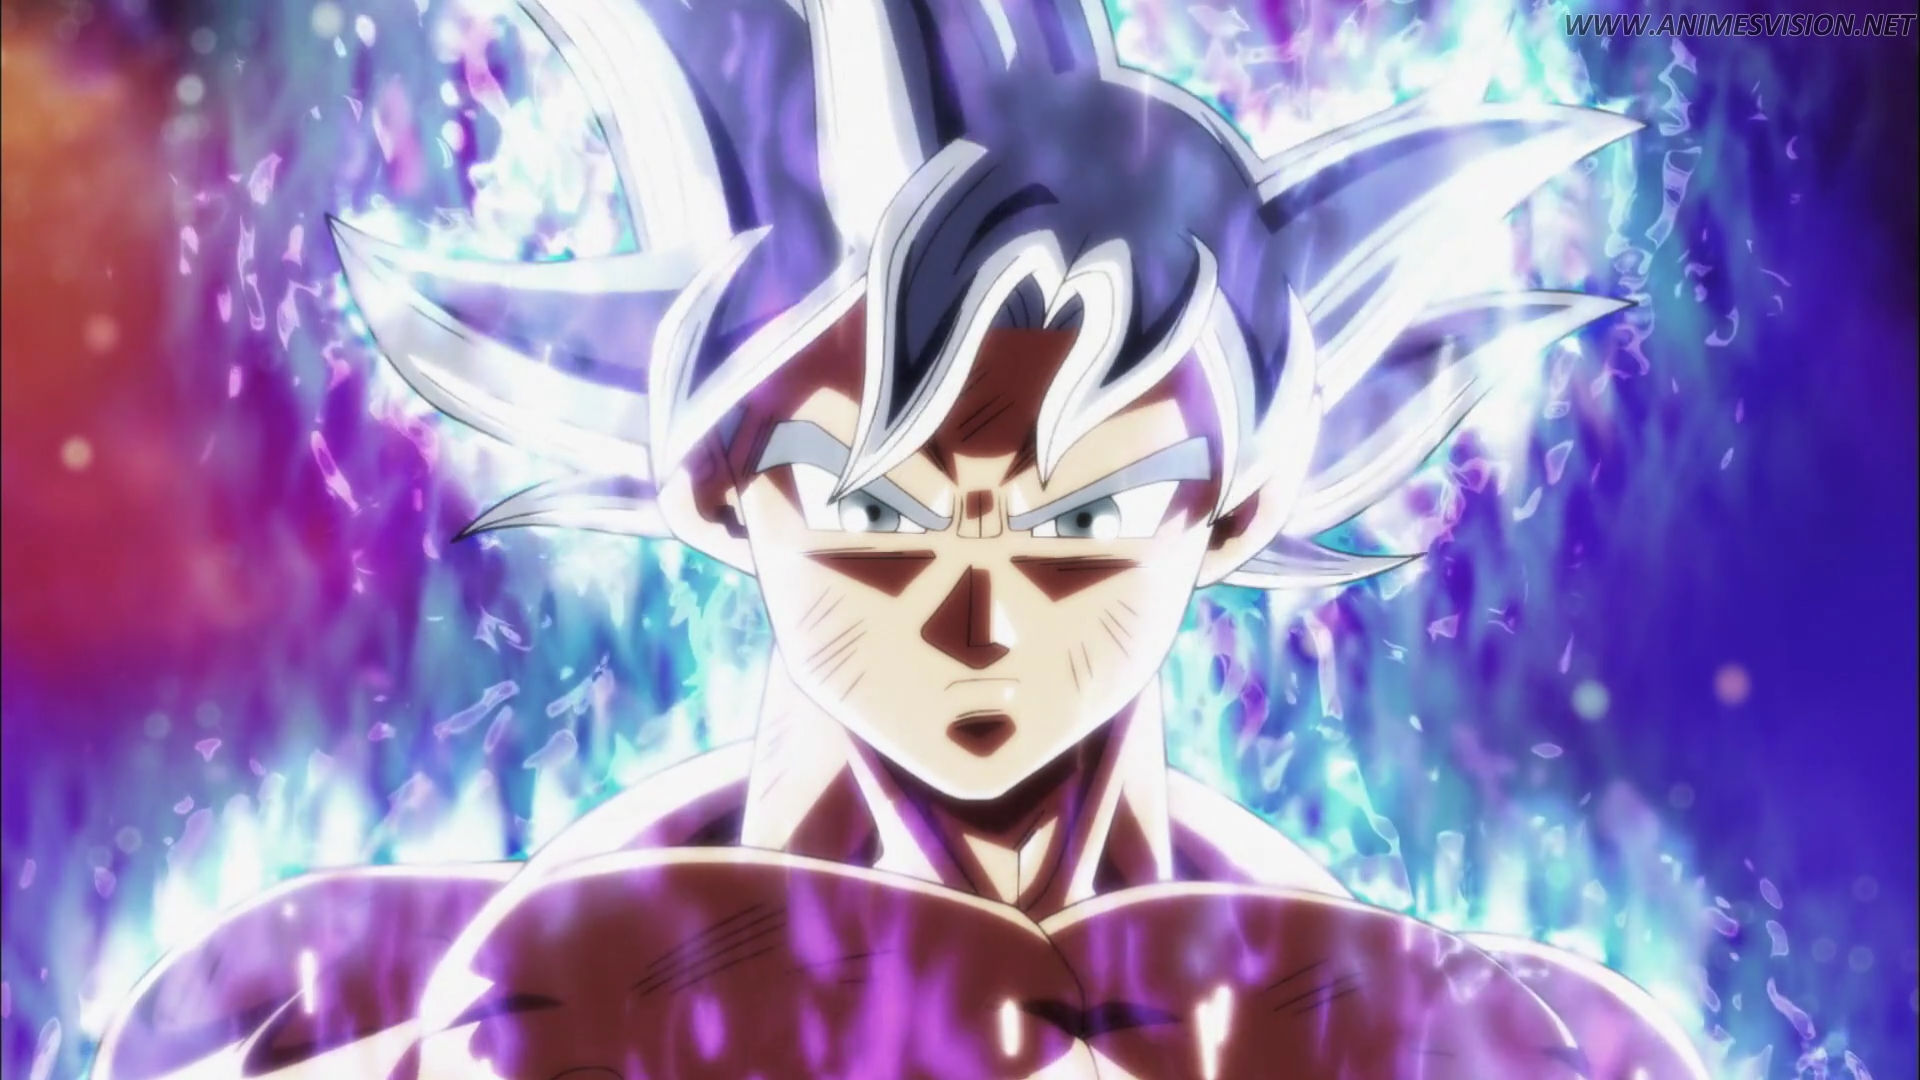 Free Download Goku Mastered Ultra Instinct Ps4wallpaperscom